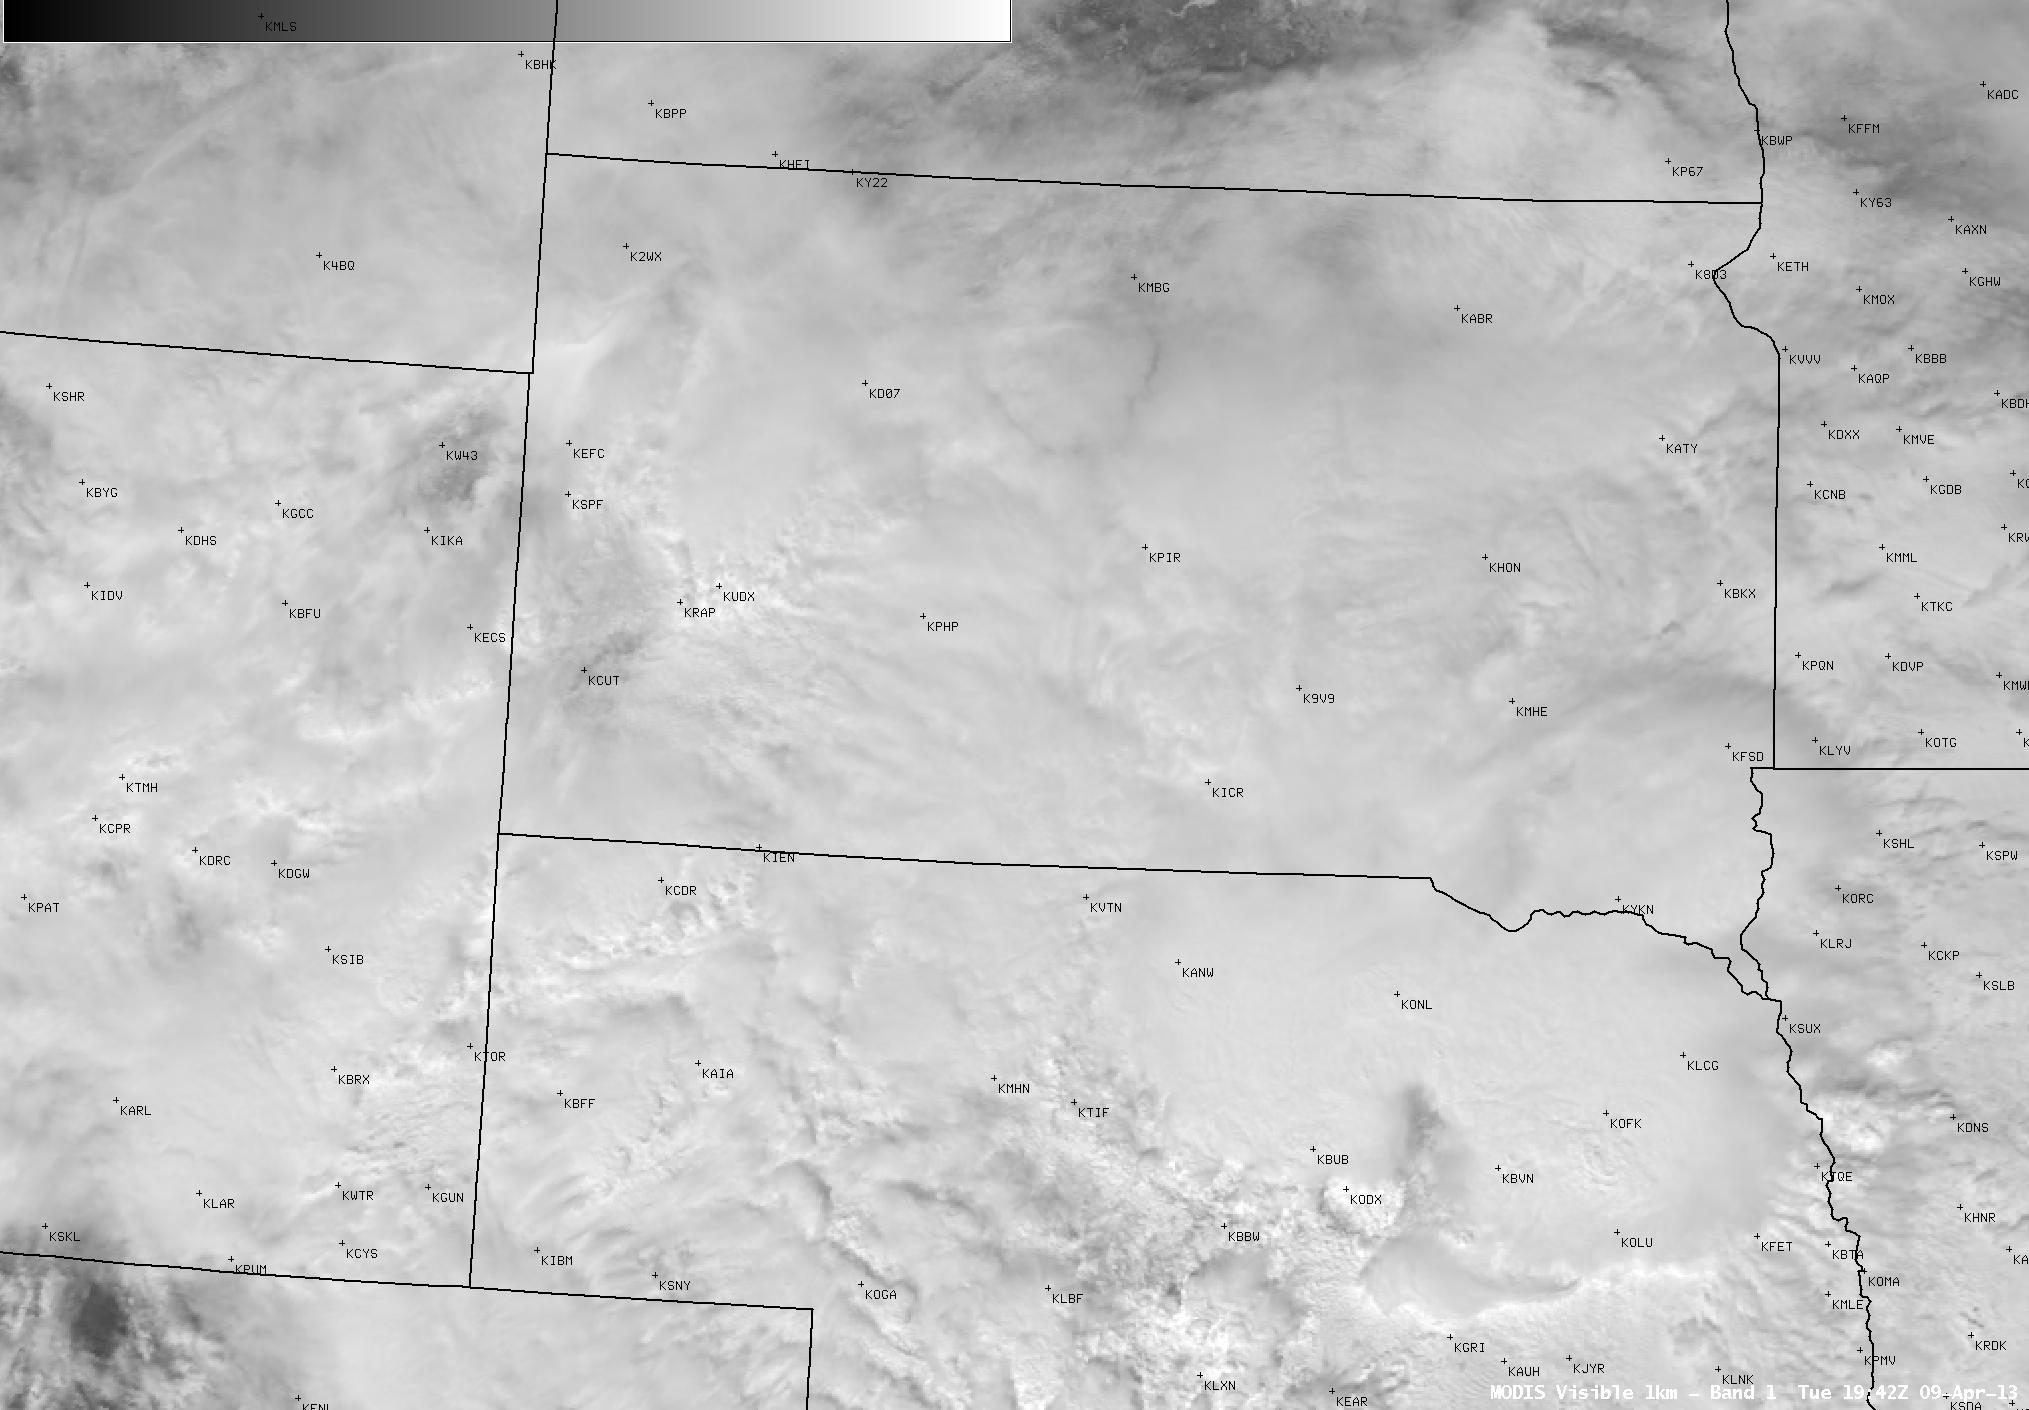 MODIS 0.65 µm visible channel image